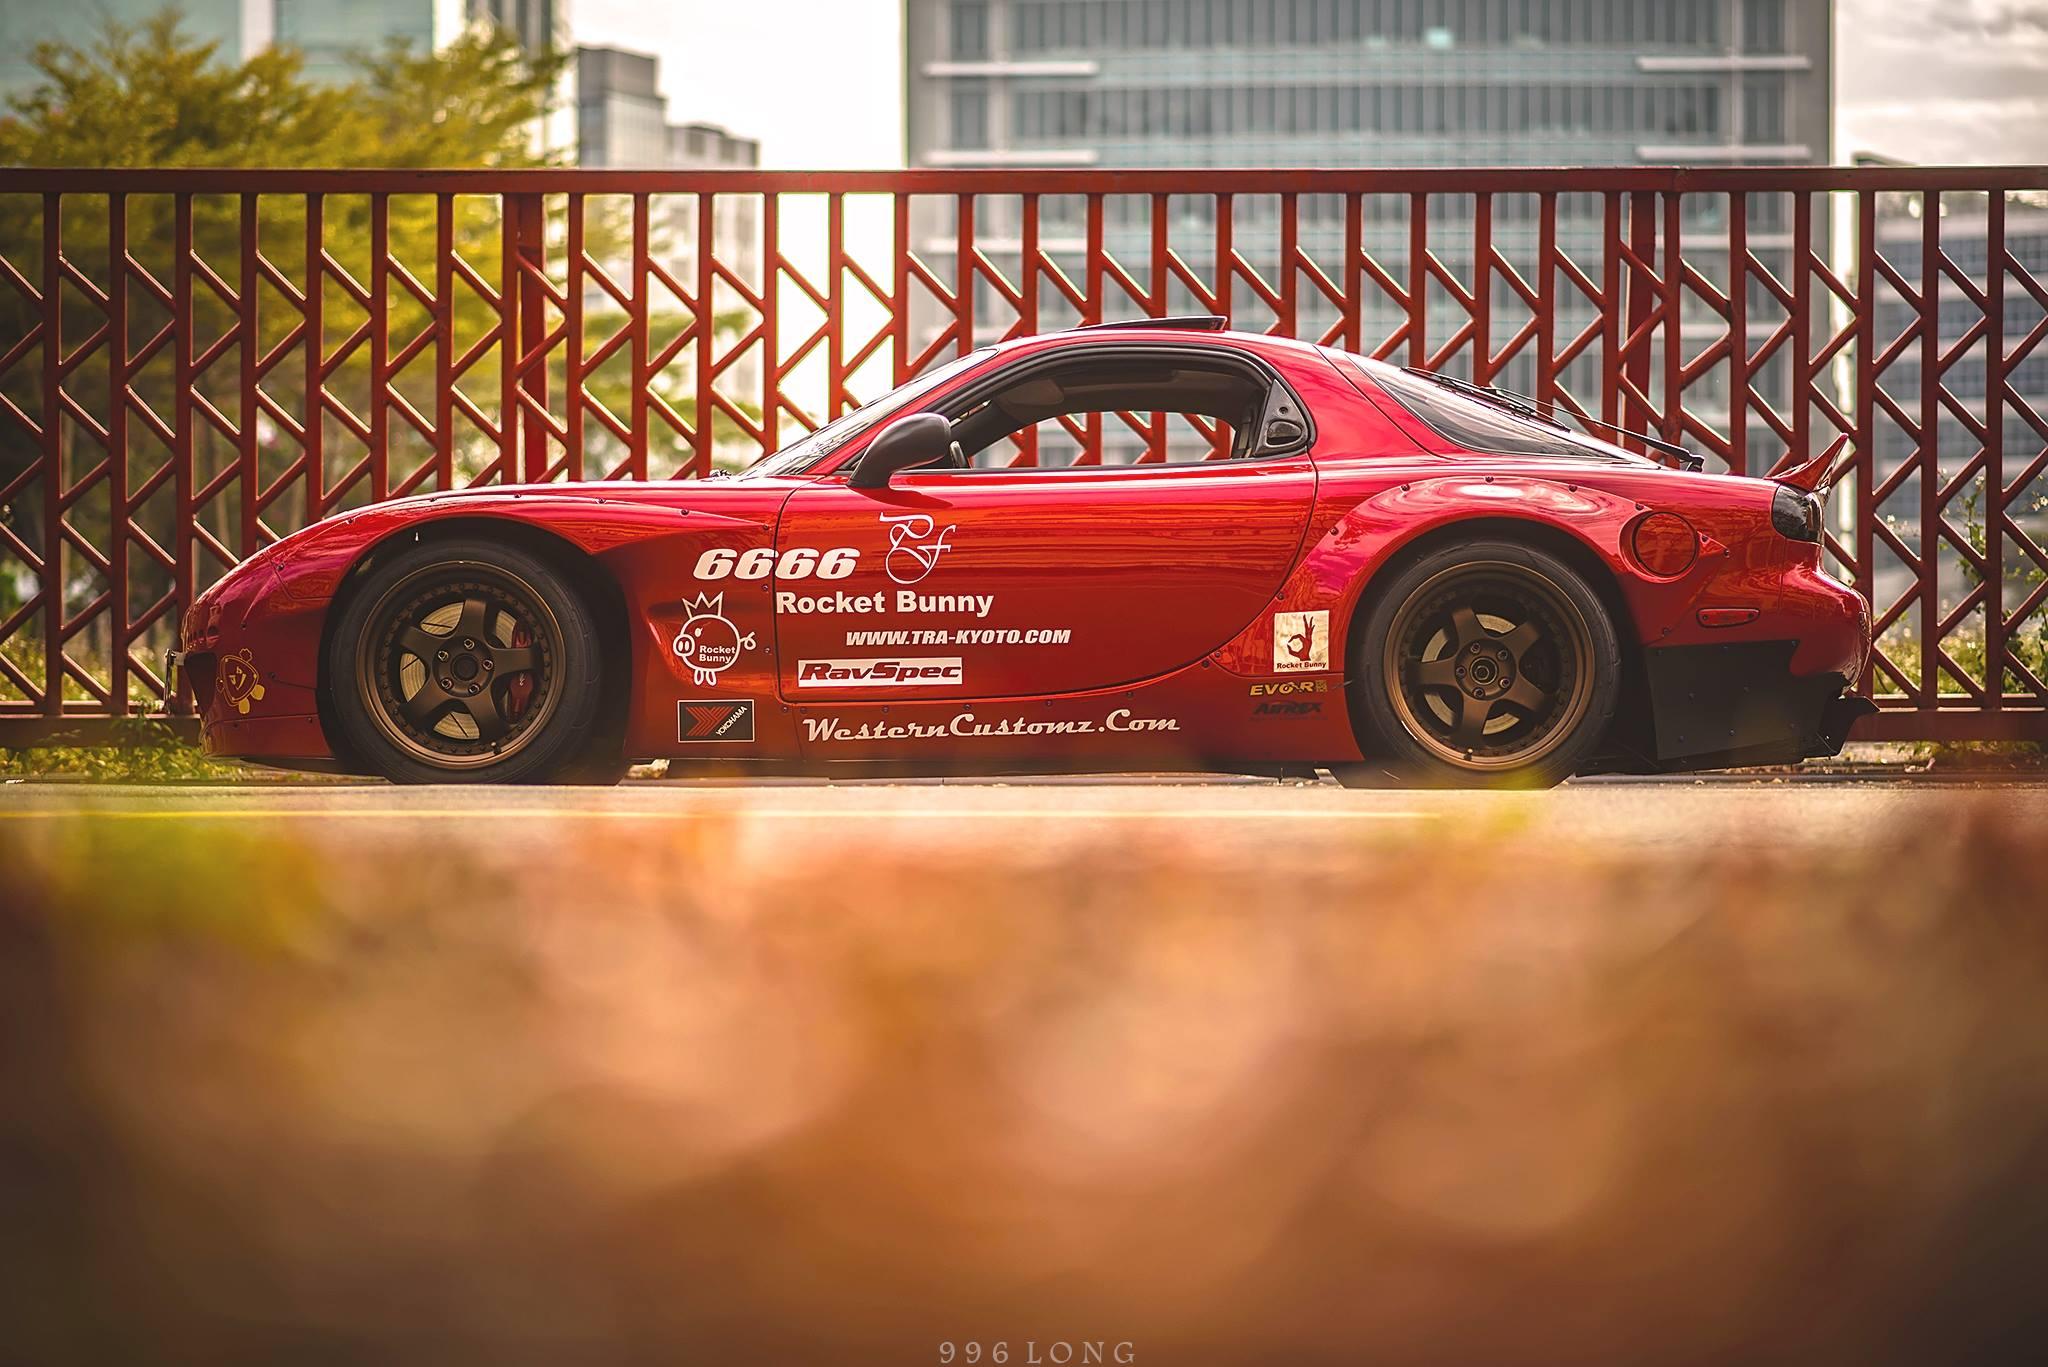 The Rocket Bunny Mazda Rx7 Stancenation Form Gt Function